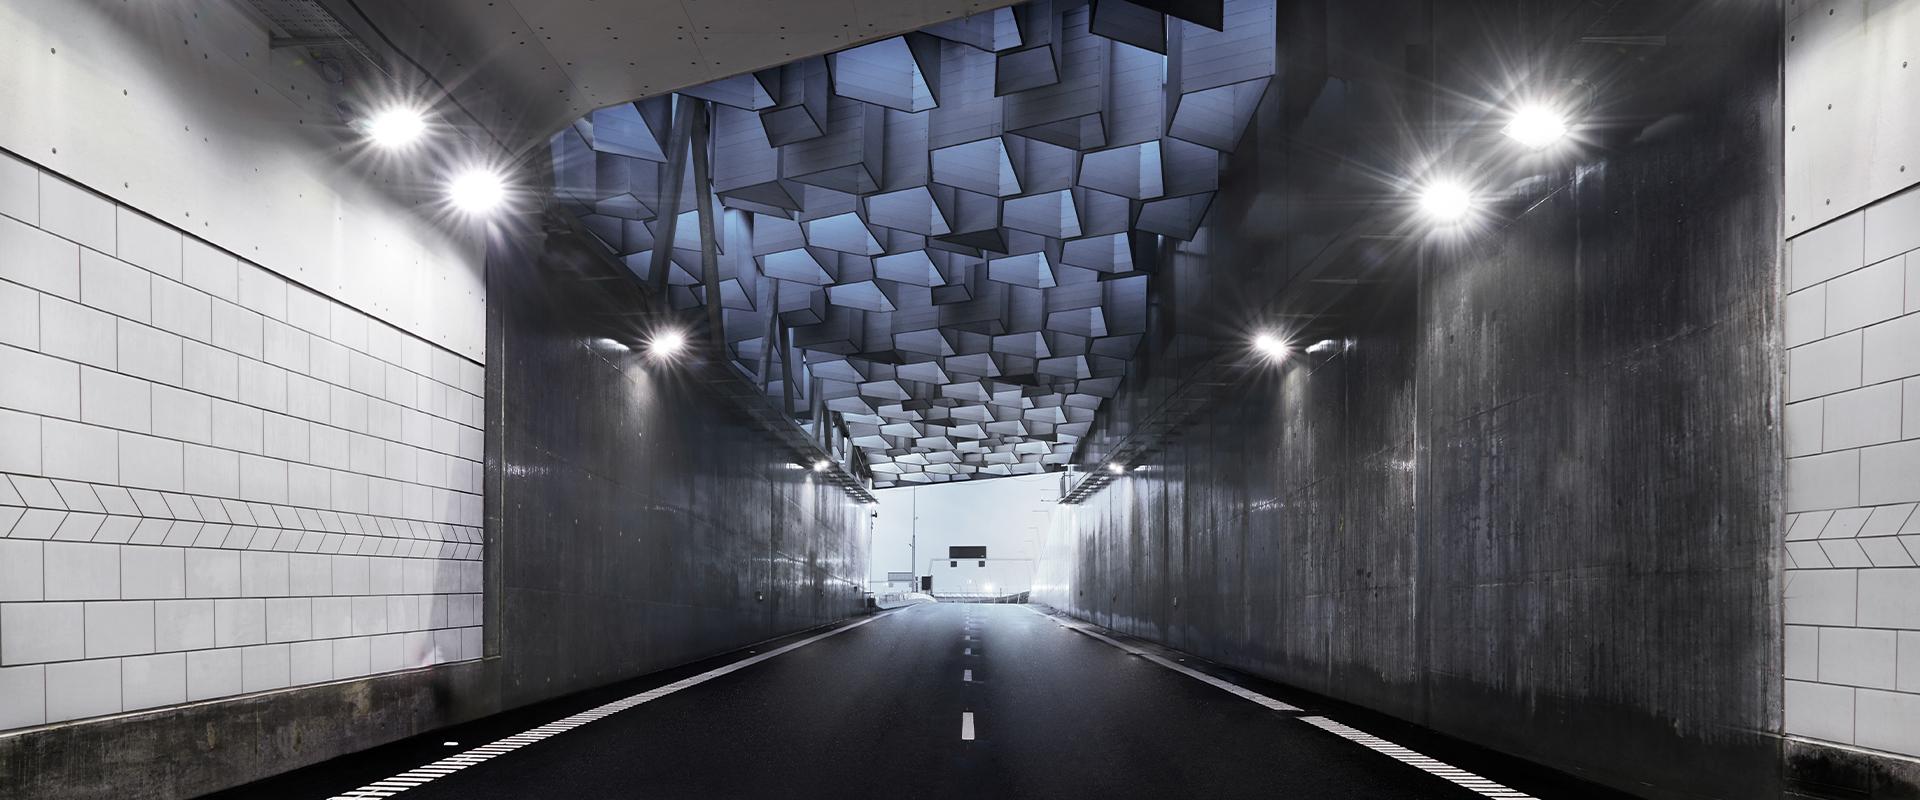 Faro LED stradale per gallerie